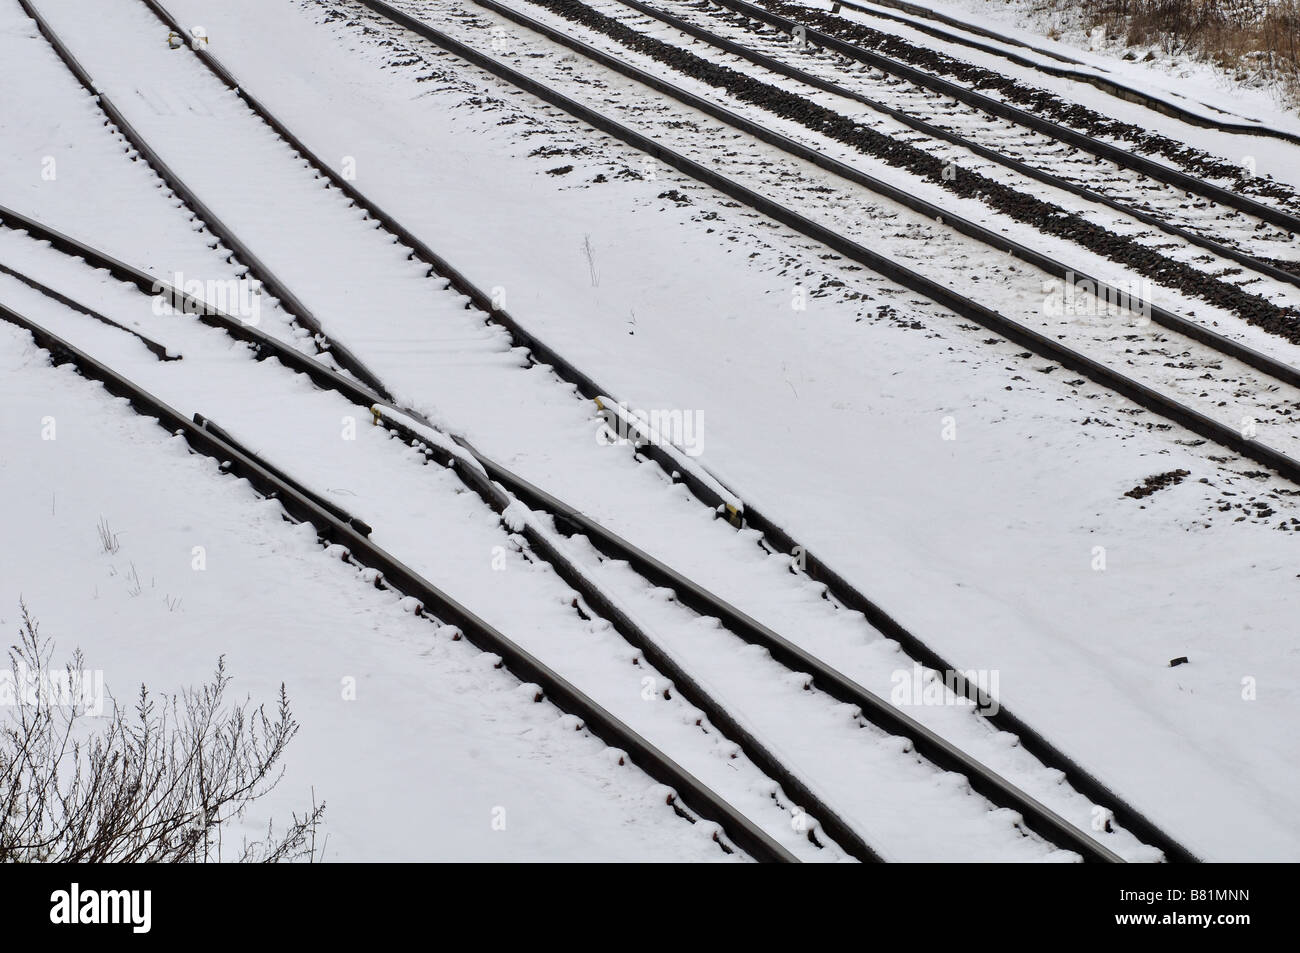 Railway lines in snow, UK - Stock Image